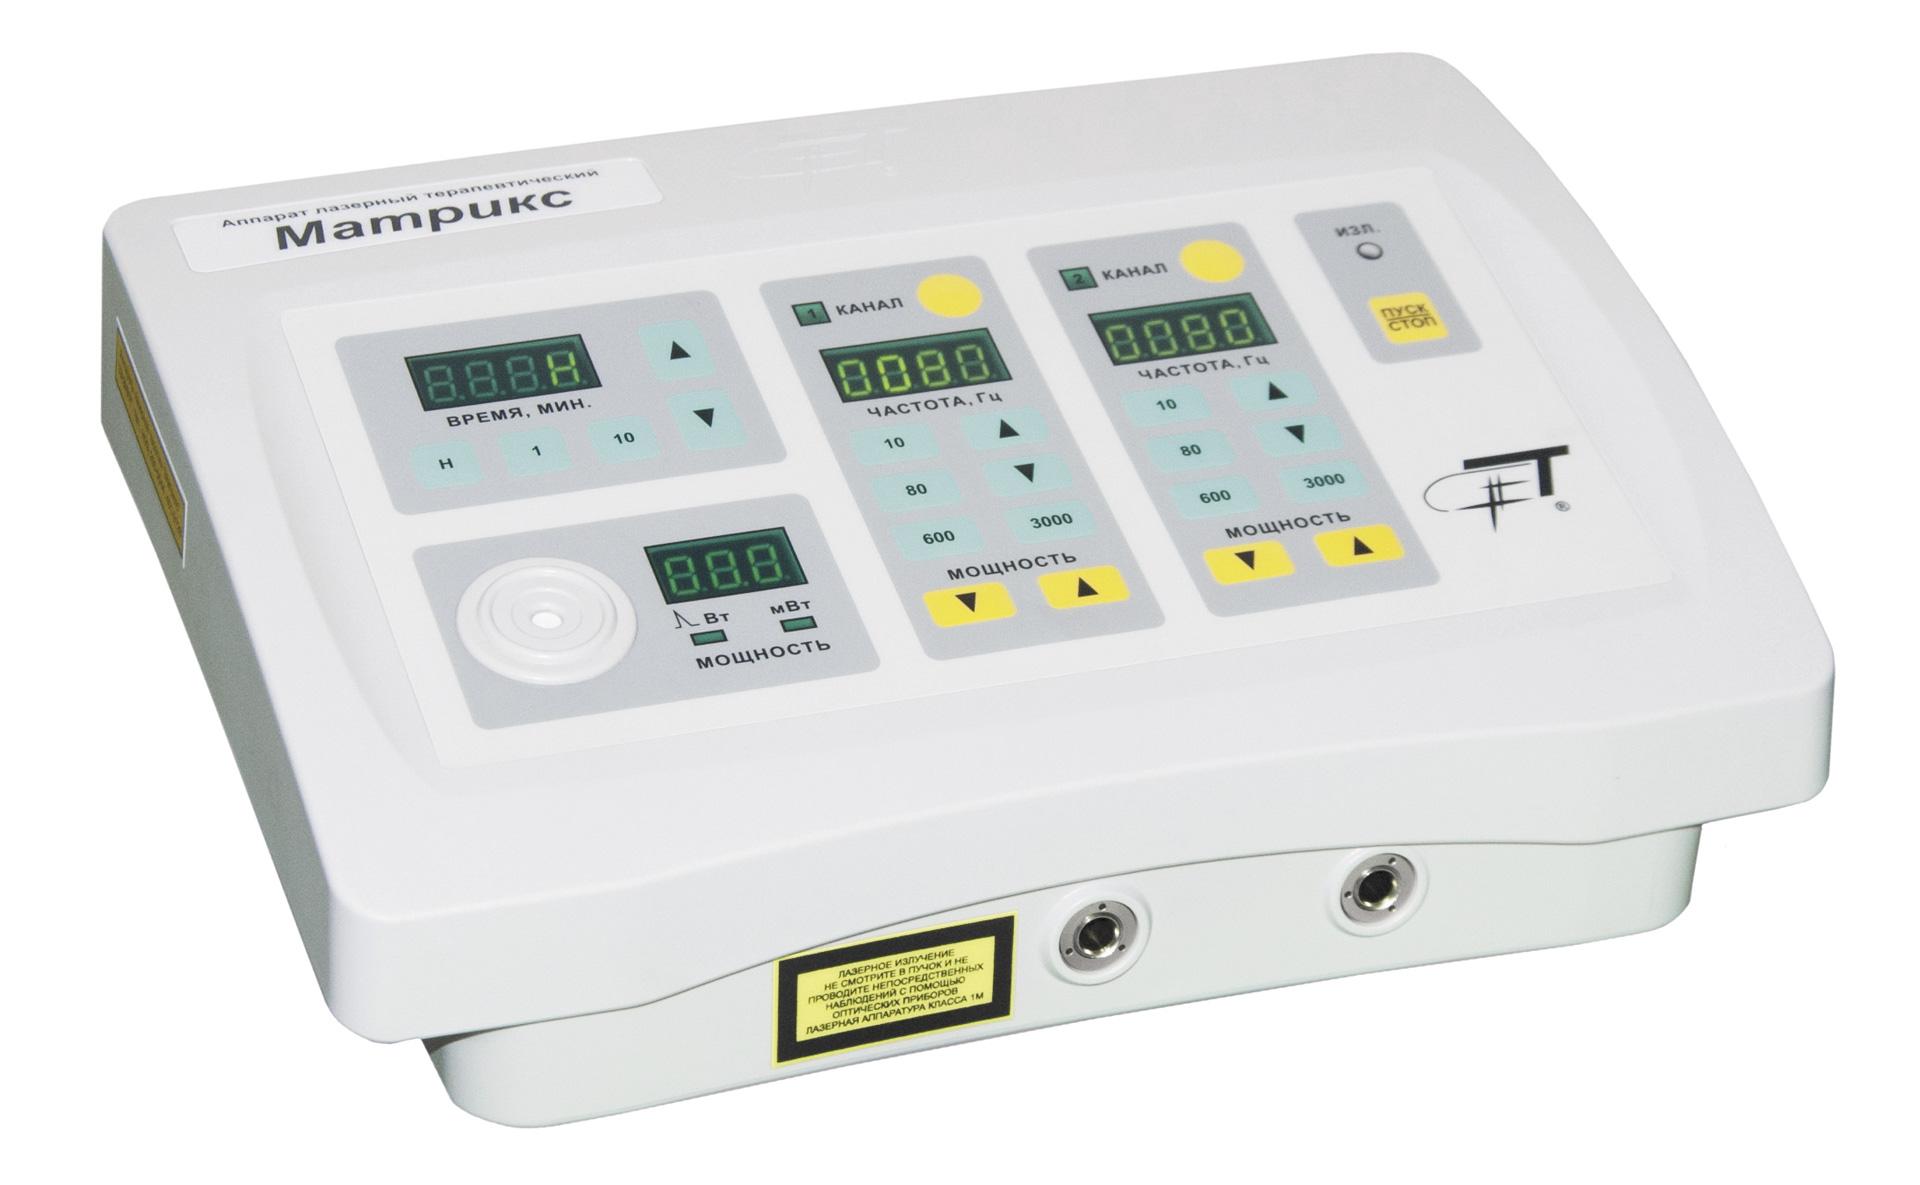 Лазерный прибор для суставов матрикс коксартроз тазобедренного сустава лече